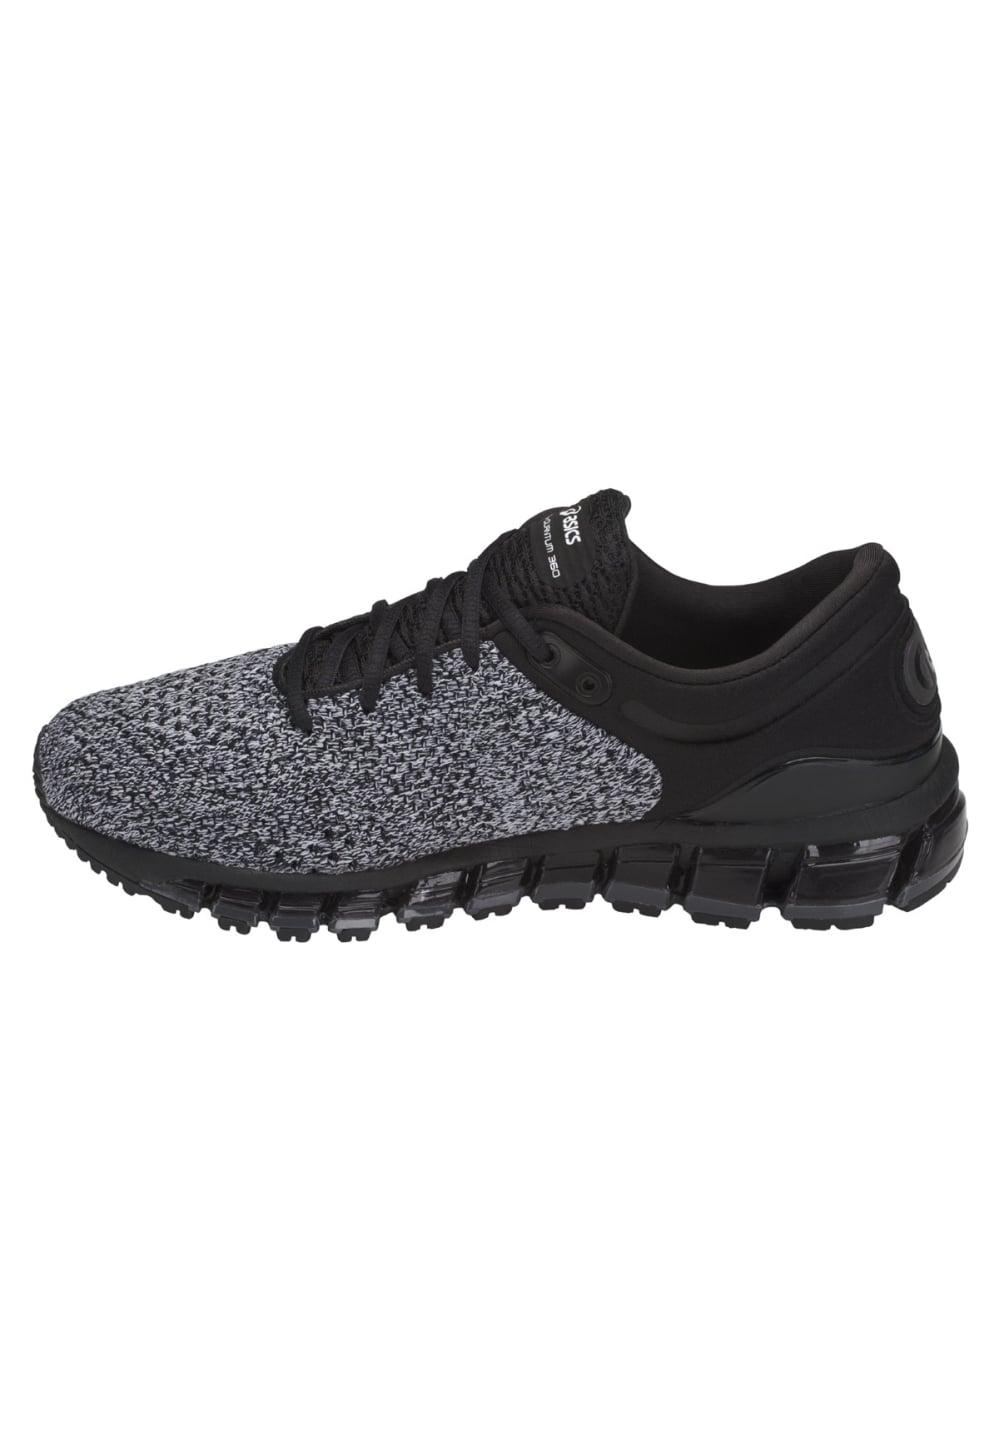 size 40 947ff 5717b ASICS GEL-Quantum 360 Knit 2 - Running shoes for Women - Black